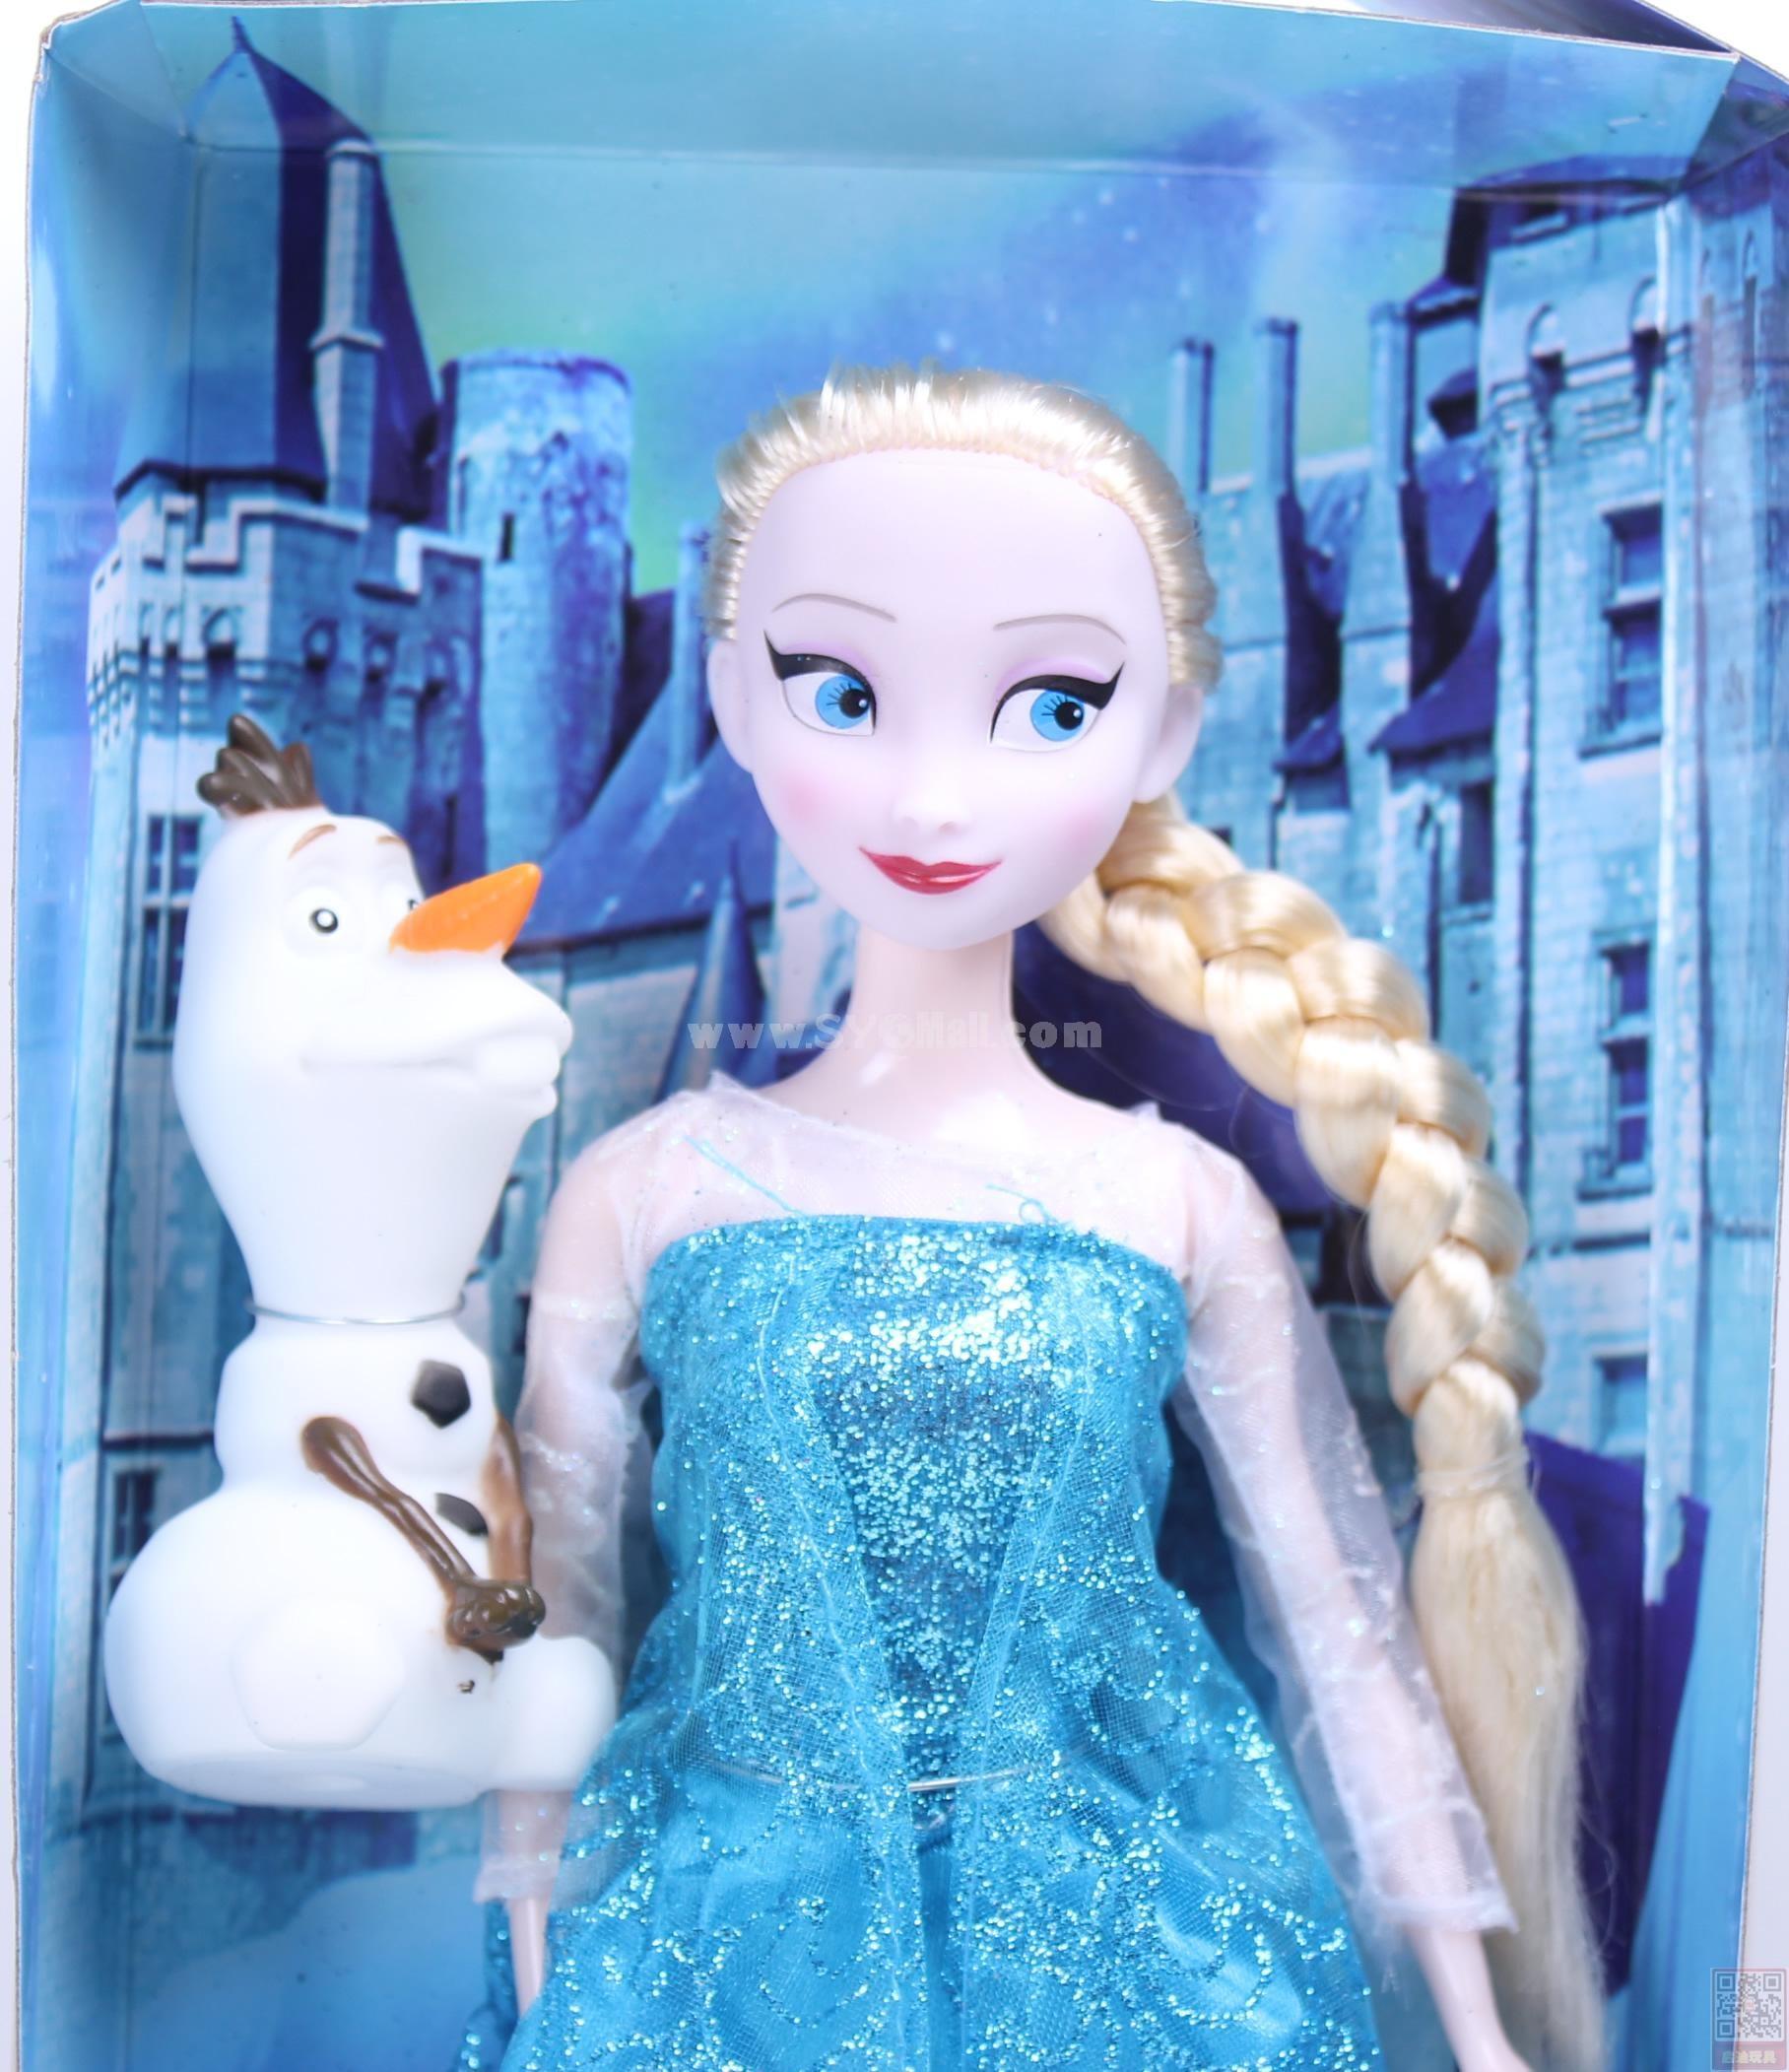 Frozen Princess Figure Toys Figure Doll 33cm/13.0inch -- Elsa with Olaf